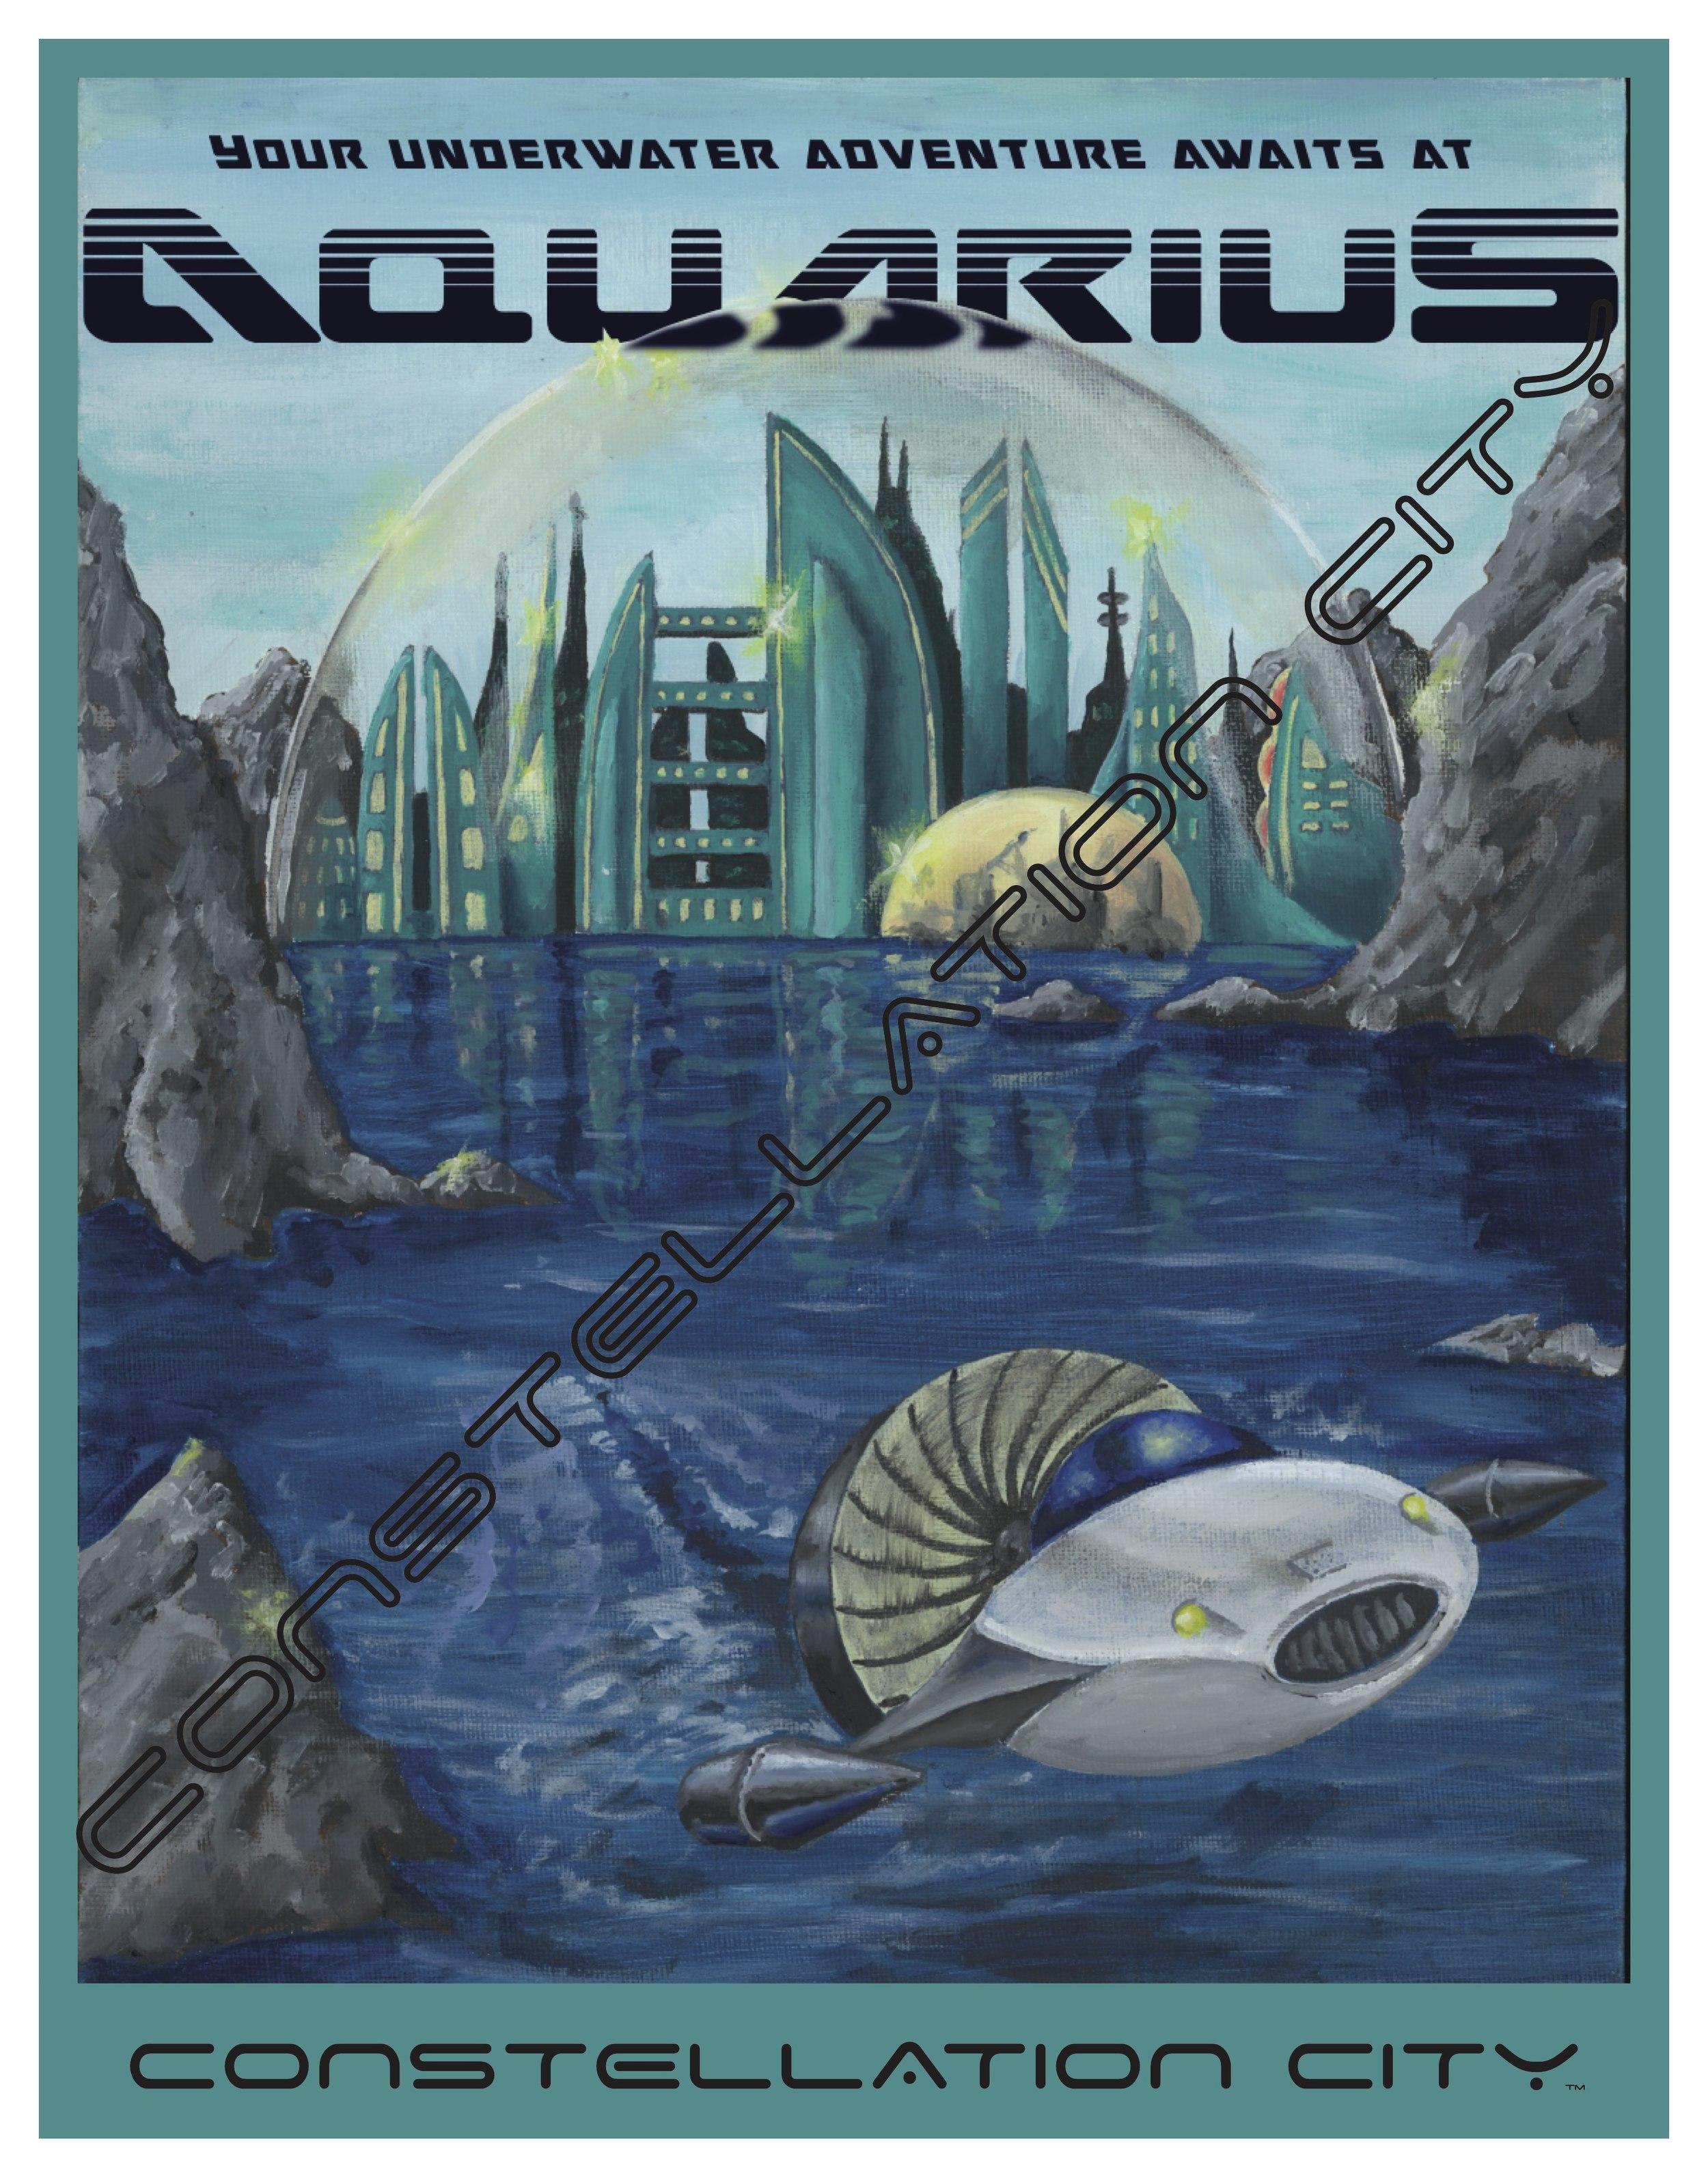 AquariusWATERMARKsmall.jpg